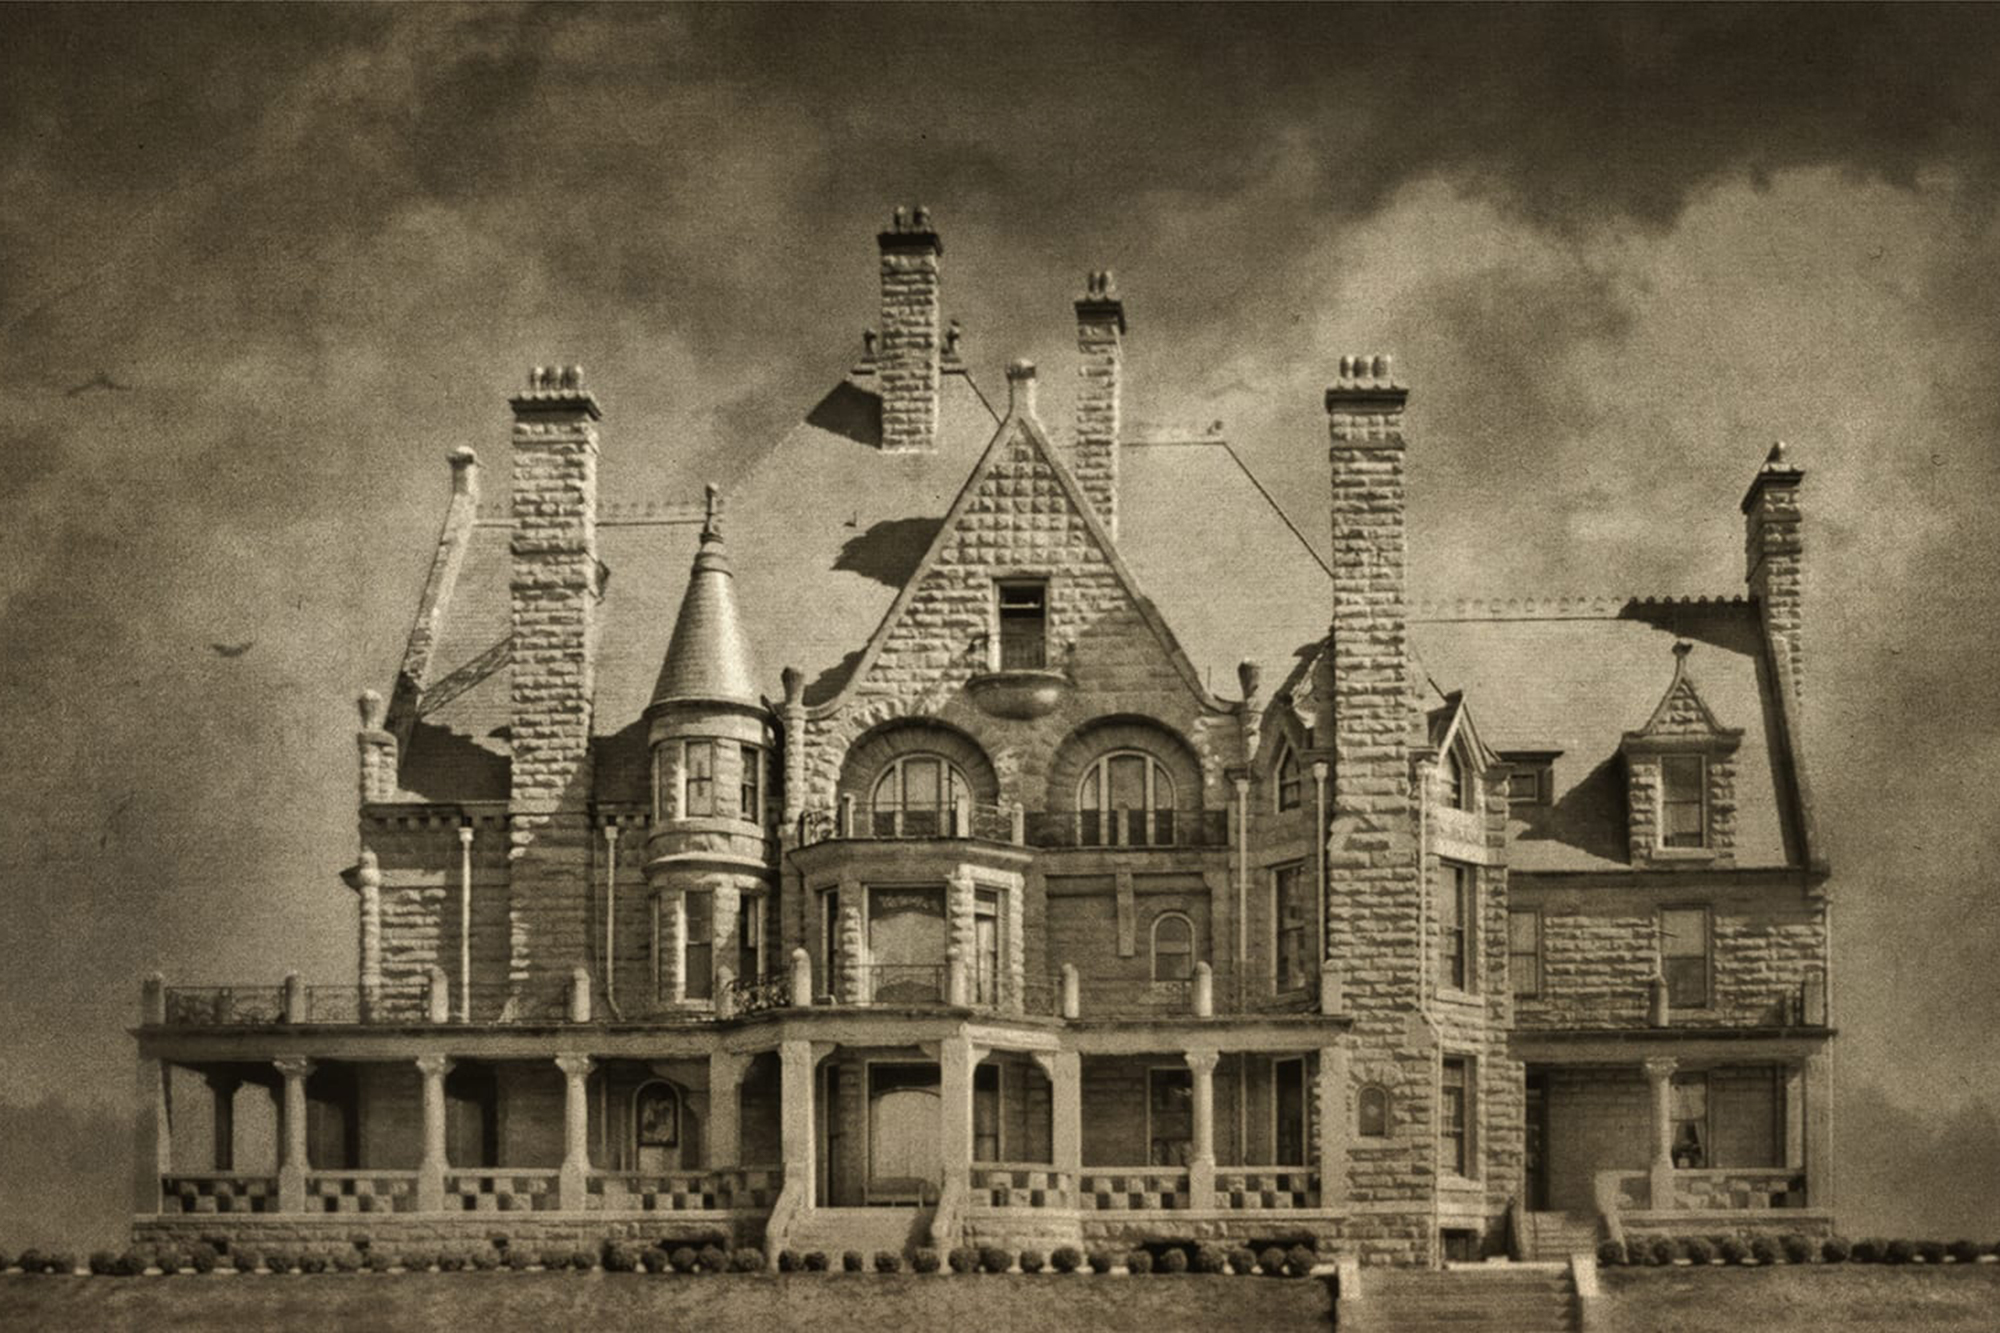 The dark money that built Victoria's Craigdarroch Castle